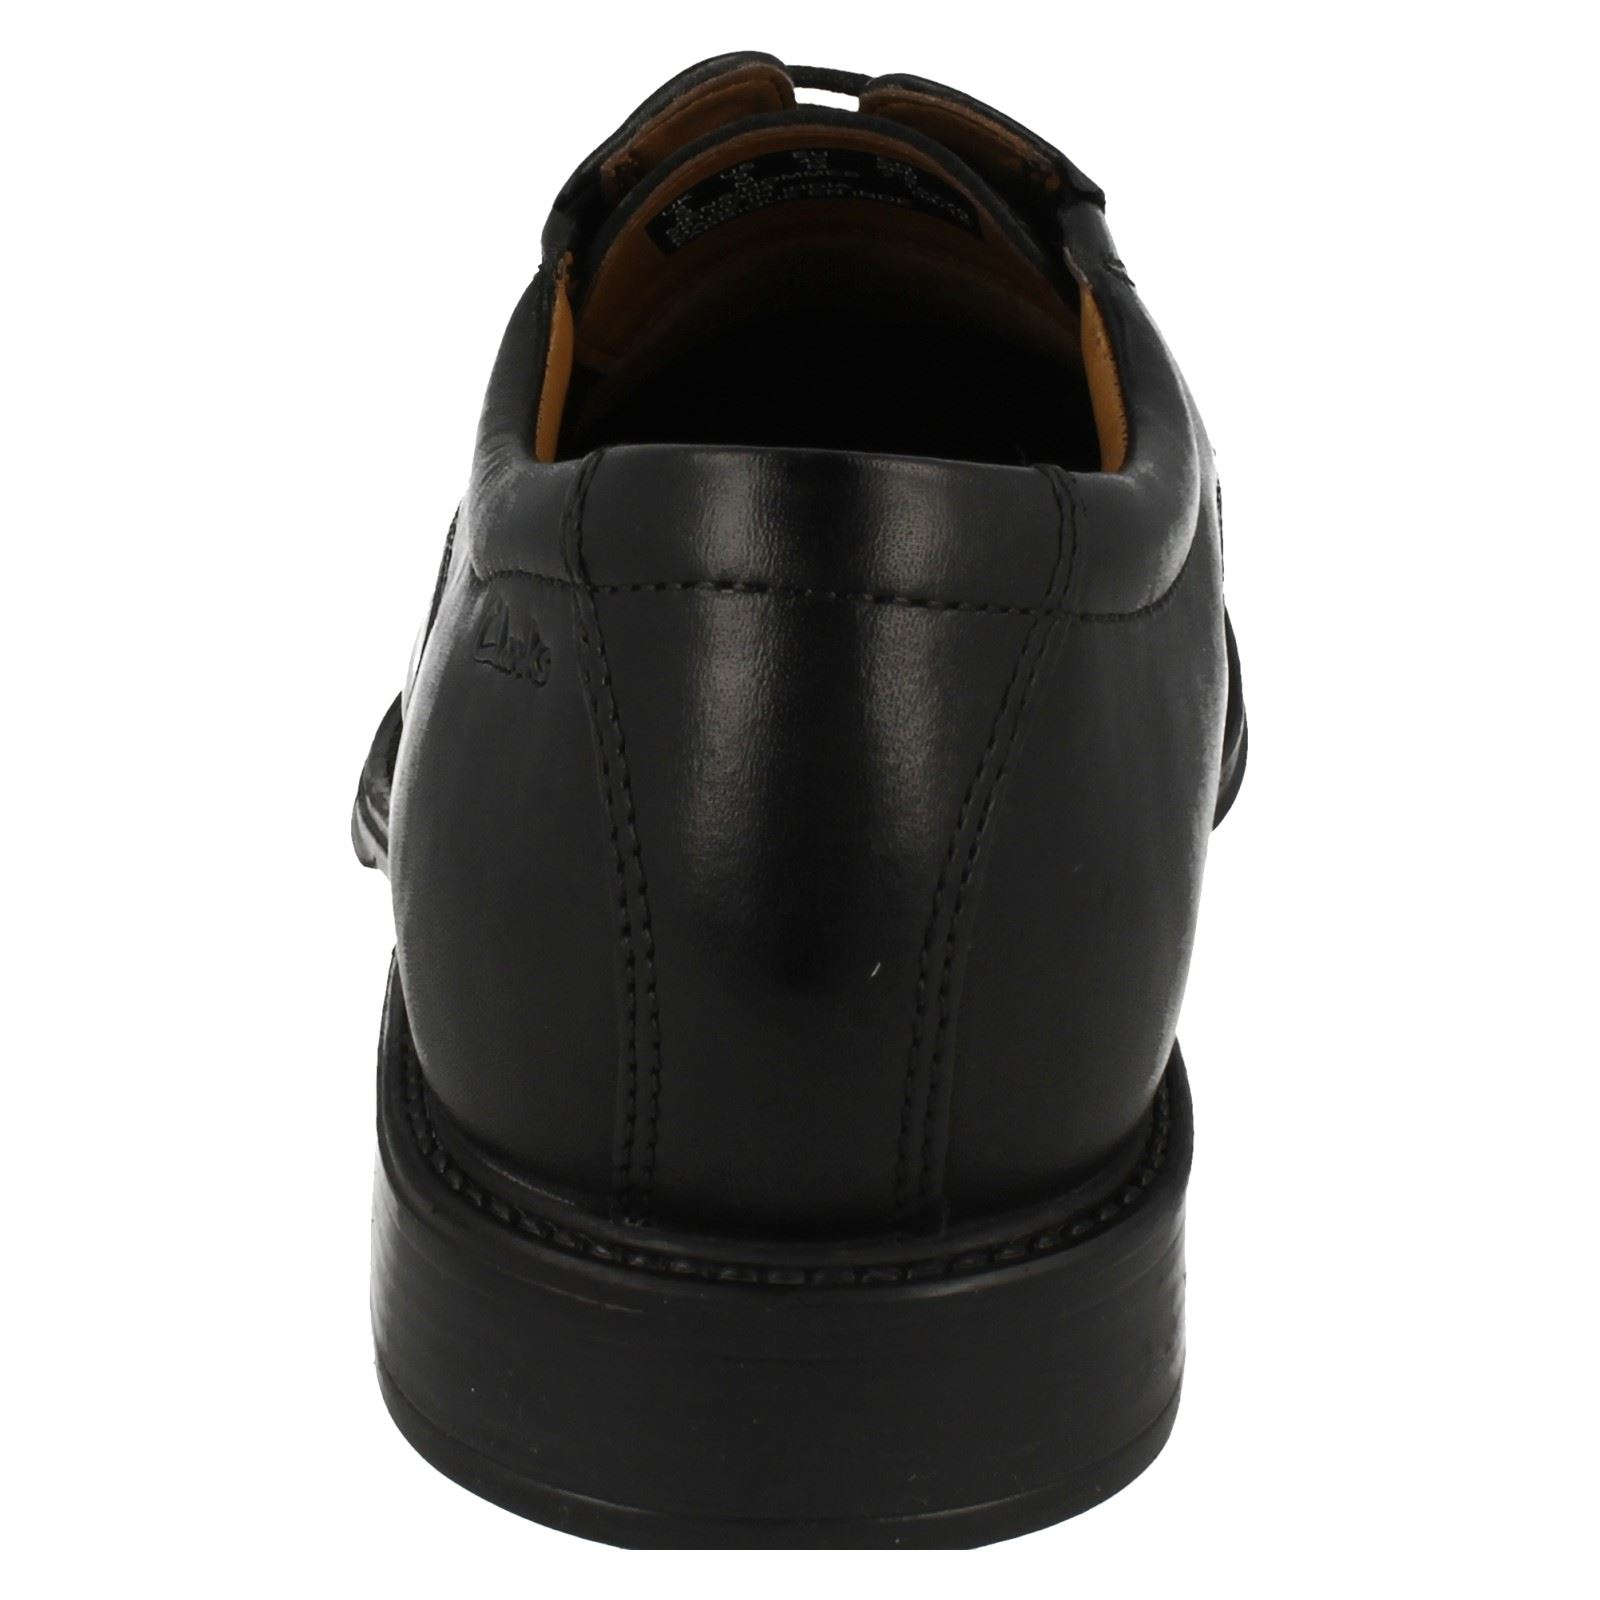 Driggs ' Con Hombre Zapatos Cordones Clarks Gorra 6OqaS7X